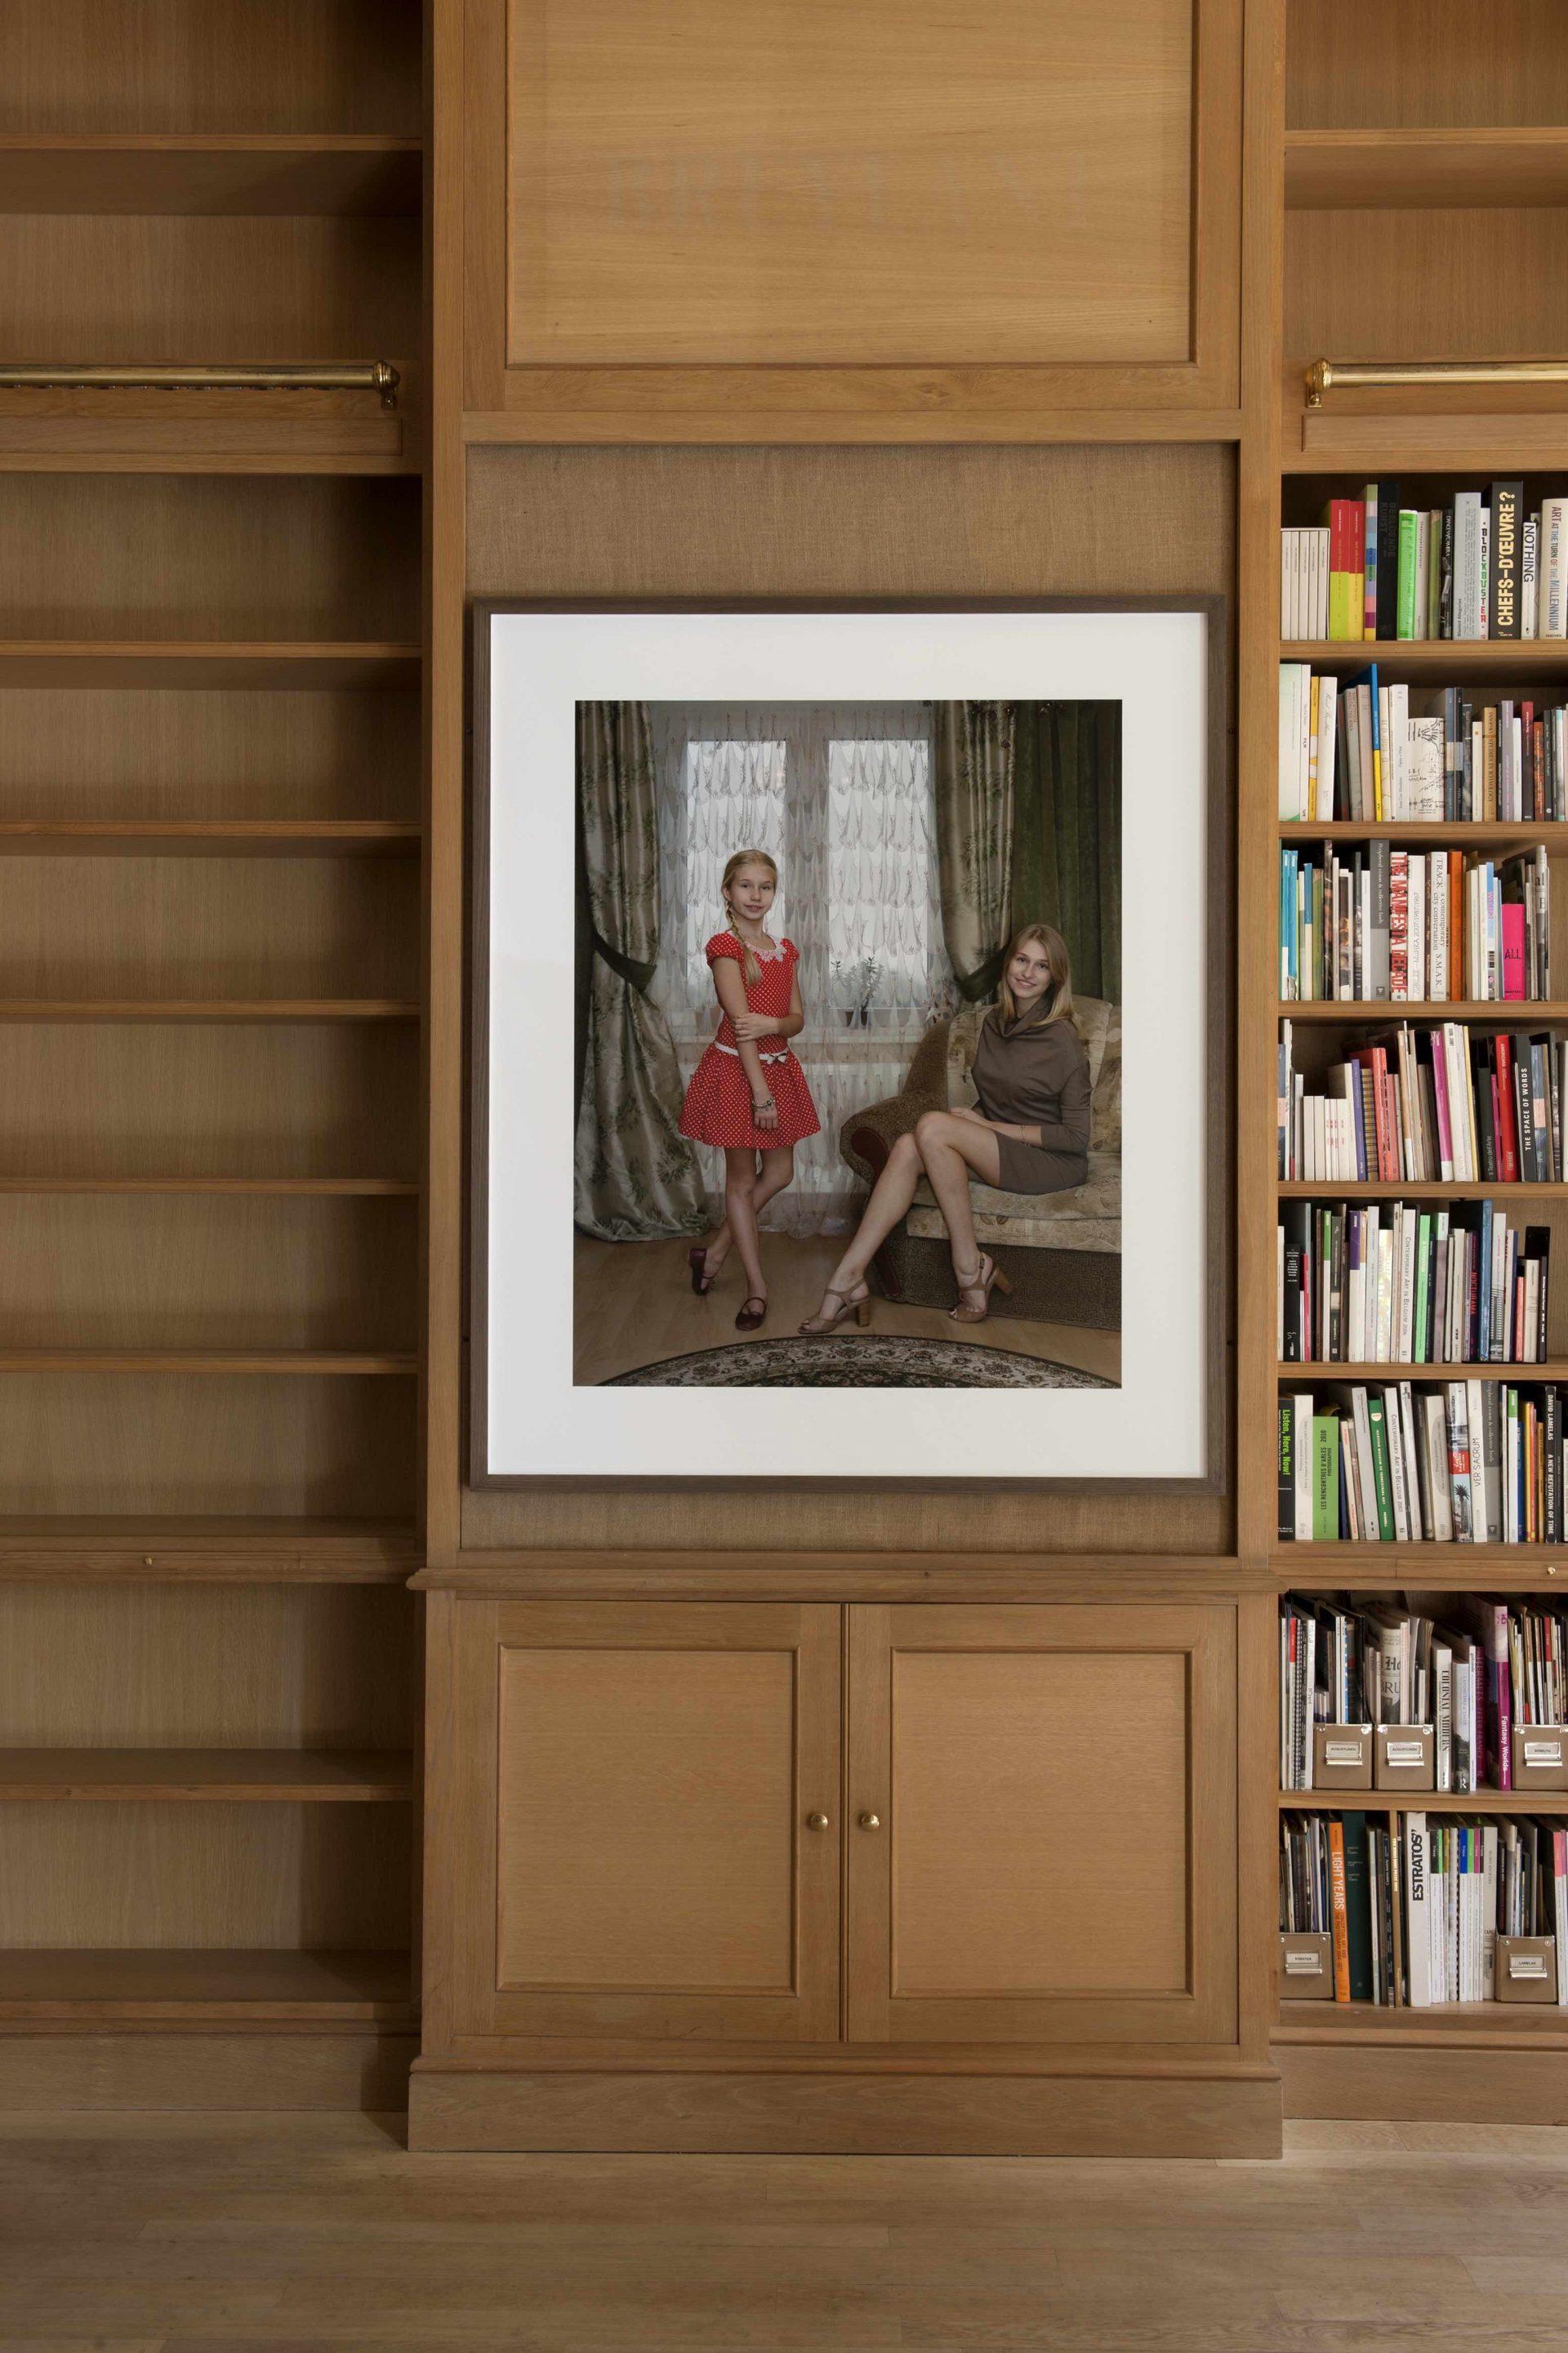 Rineke Dijkstra Marianna and Sasha, Kingisepp, Russia, November 2, 2014, 2014 archival inkjet print 117 x 93 cm (image)